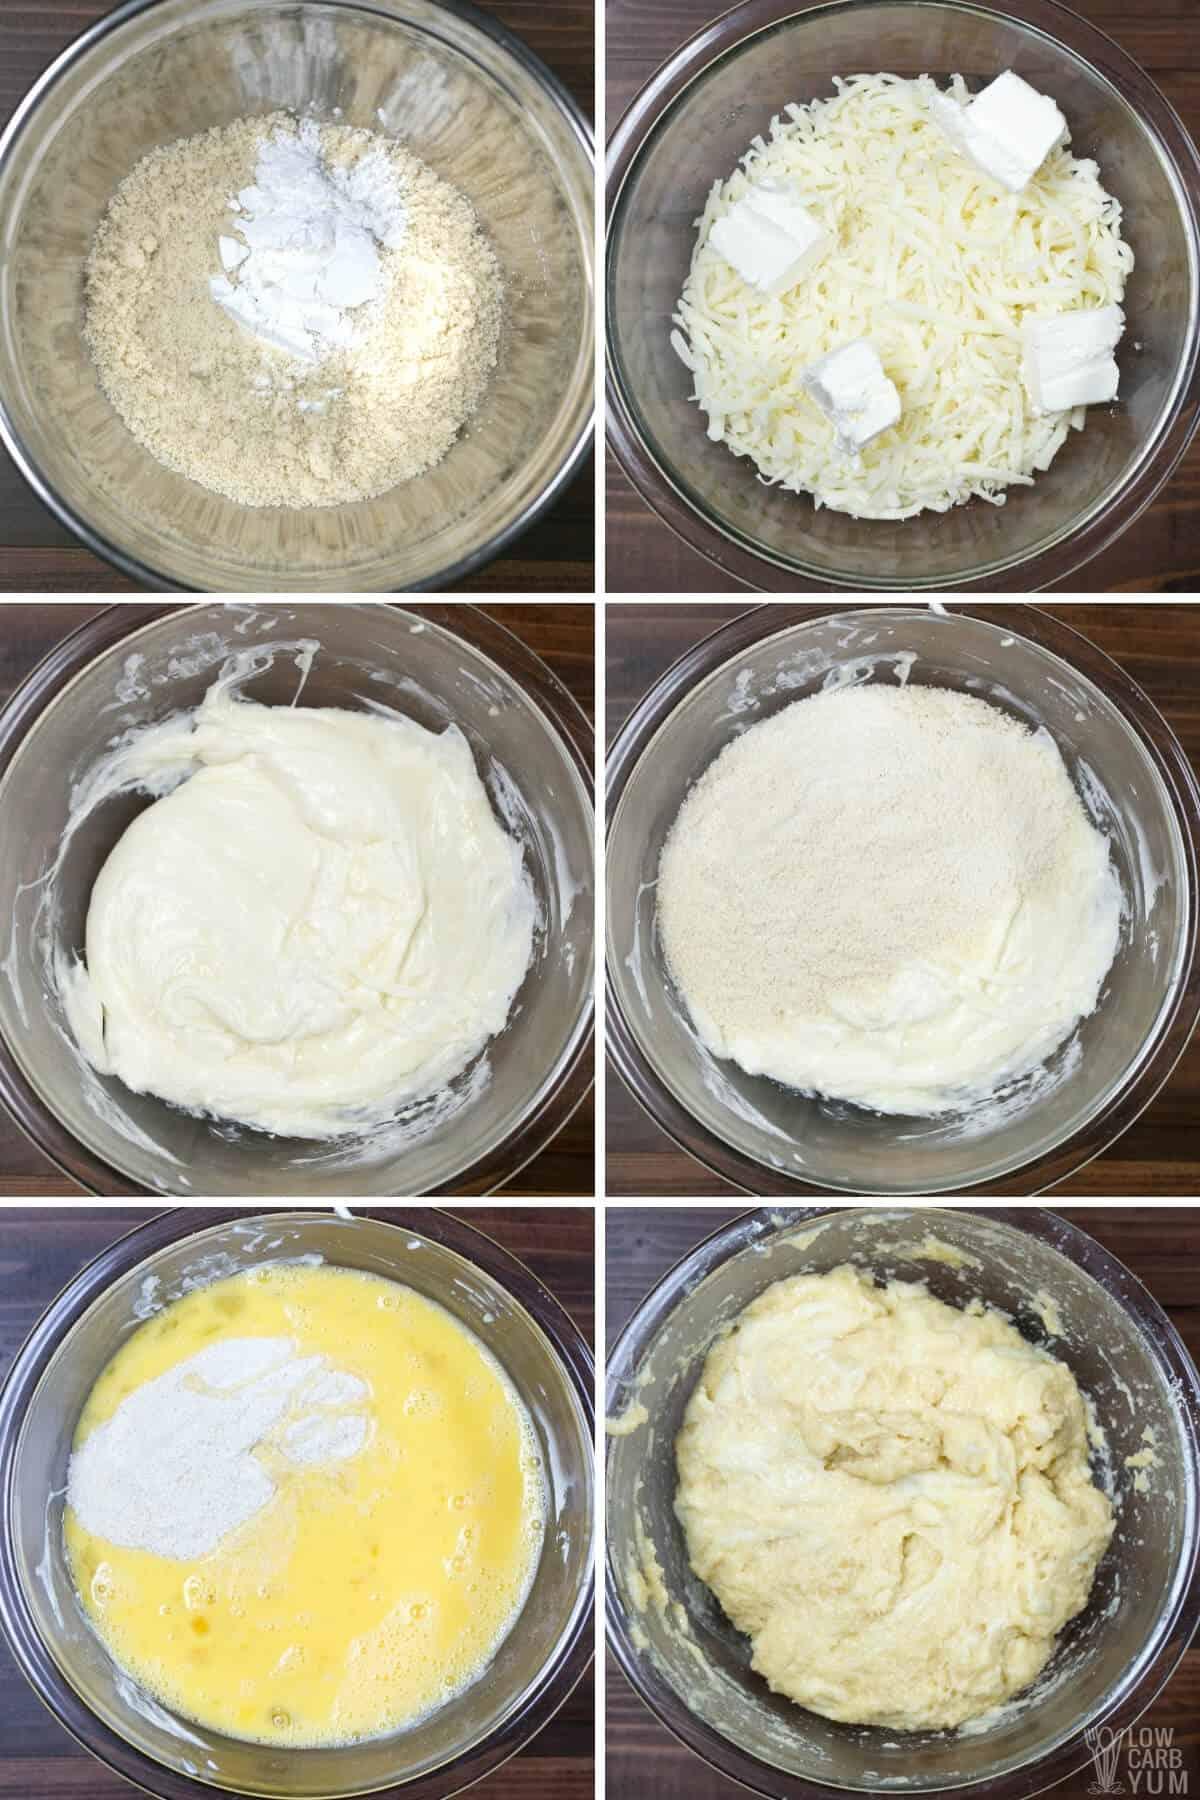 making coconut flour fathead dough